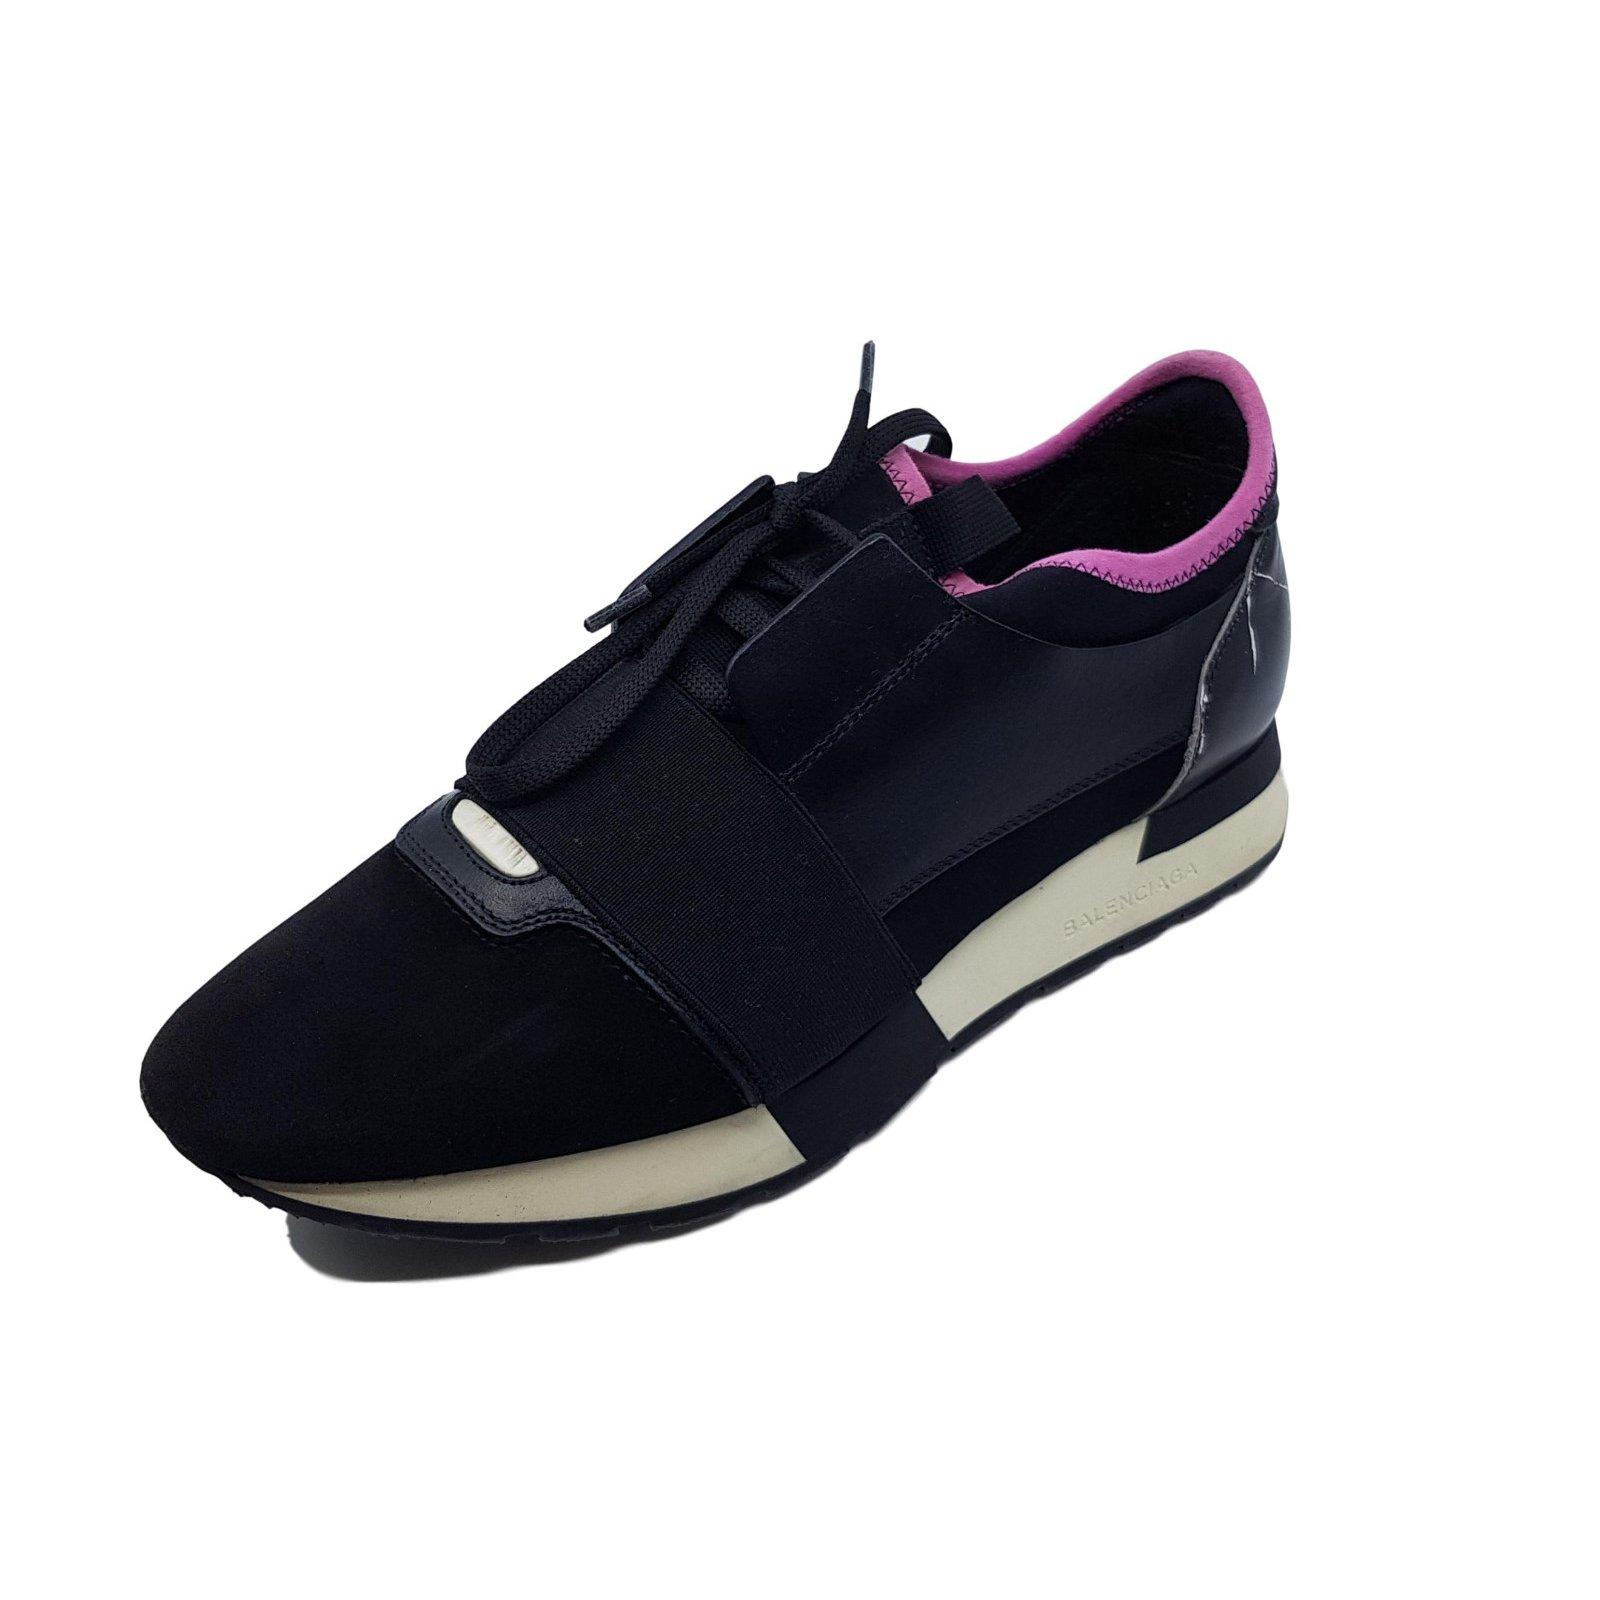 Balenciaga Race trainers Sneakers